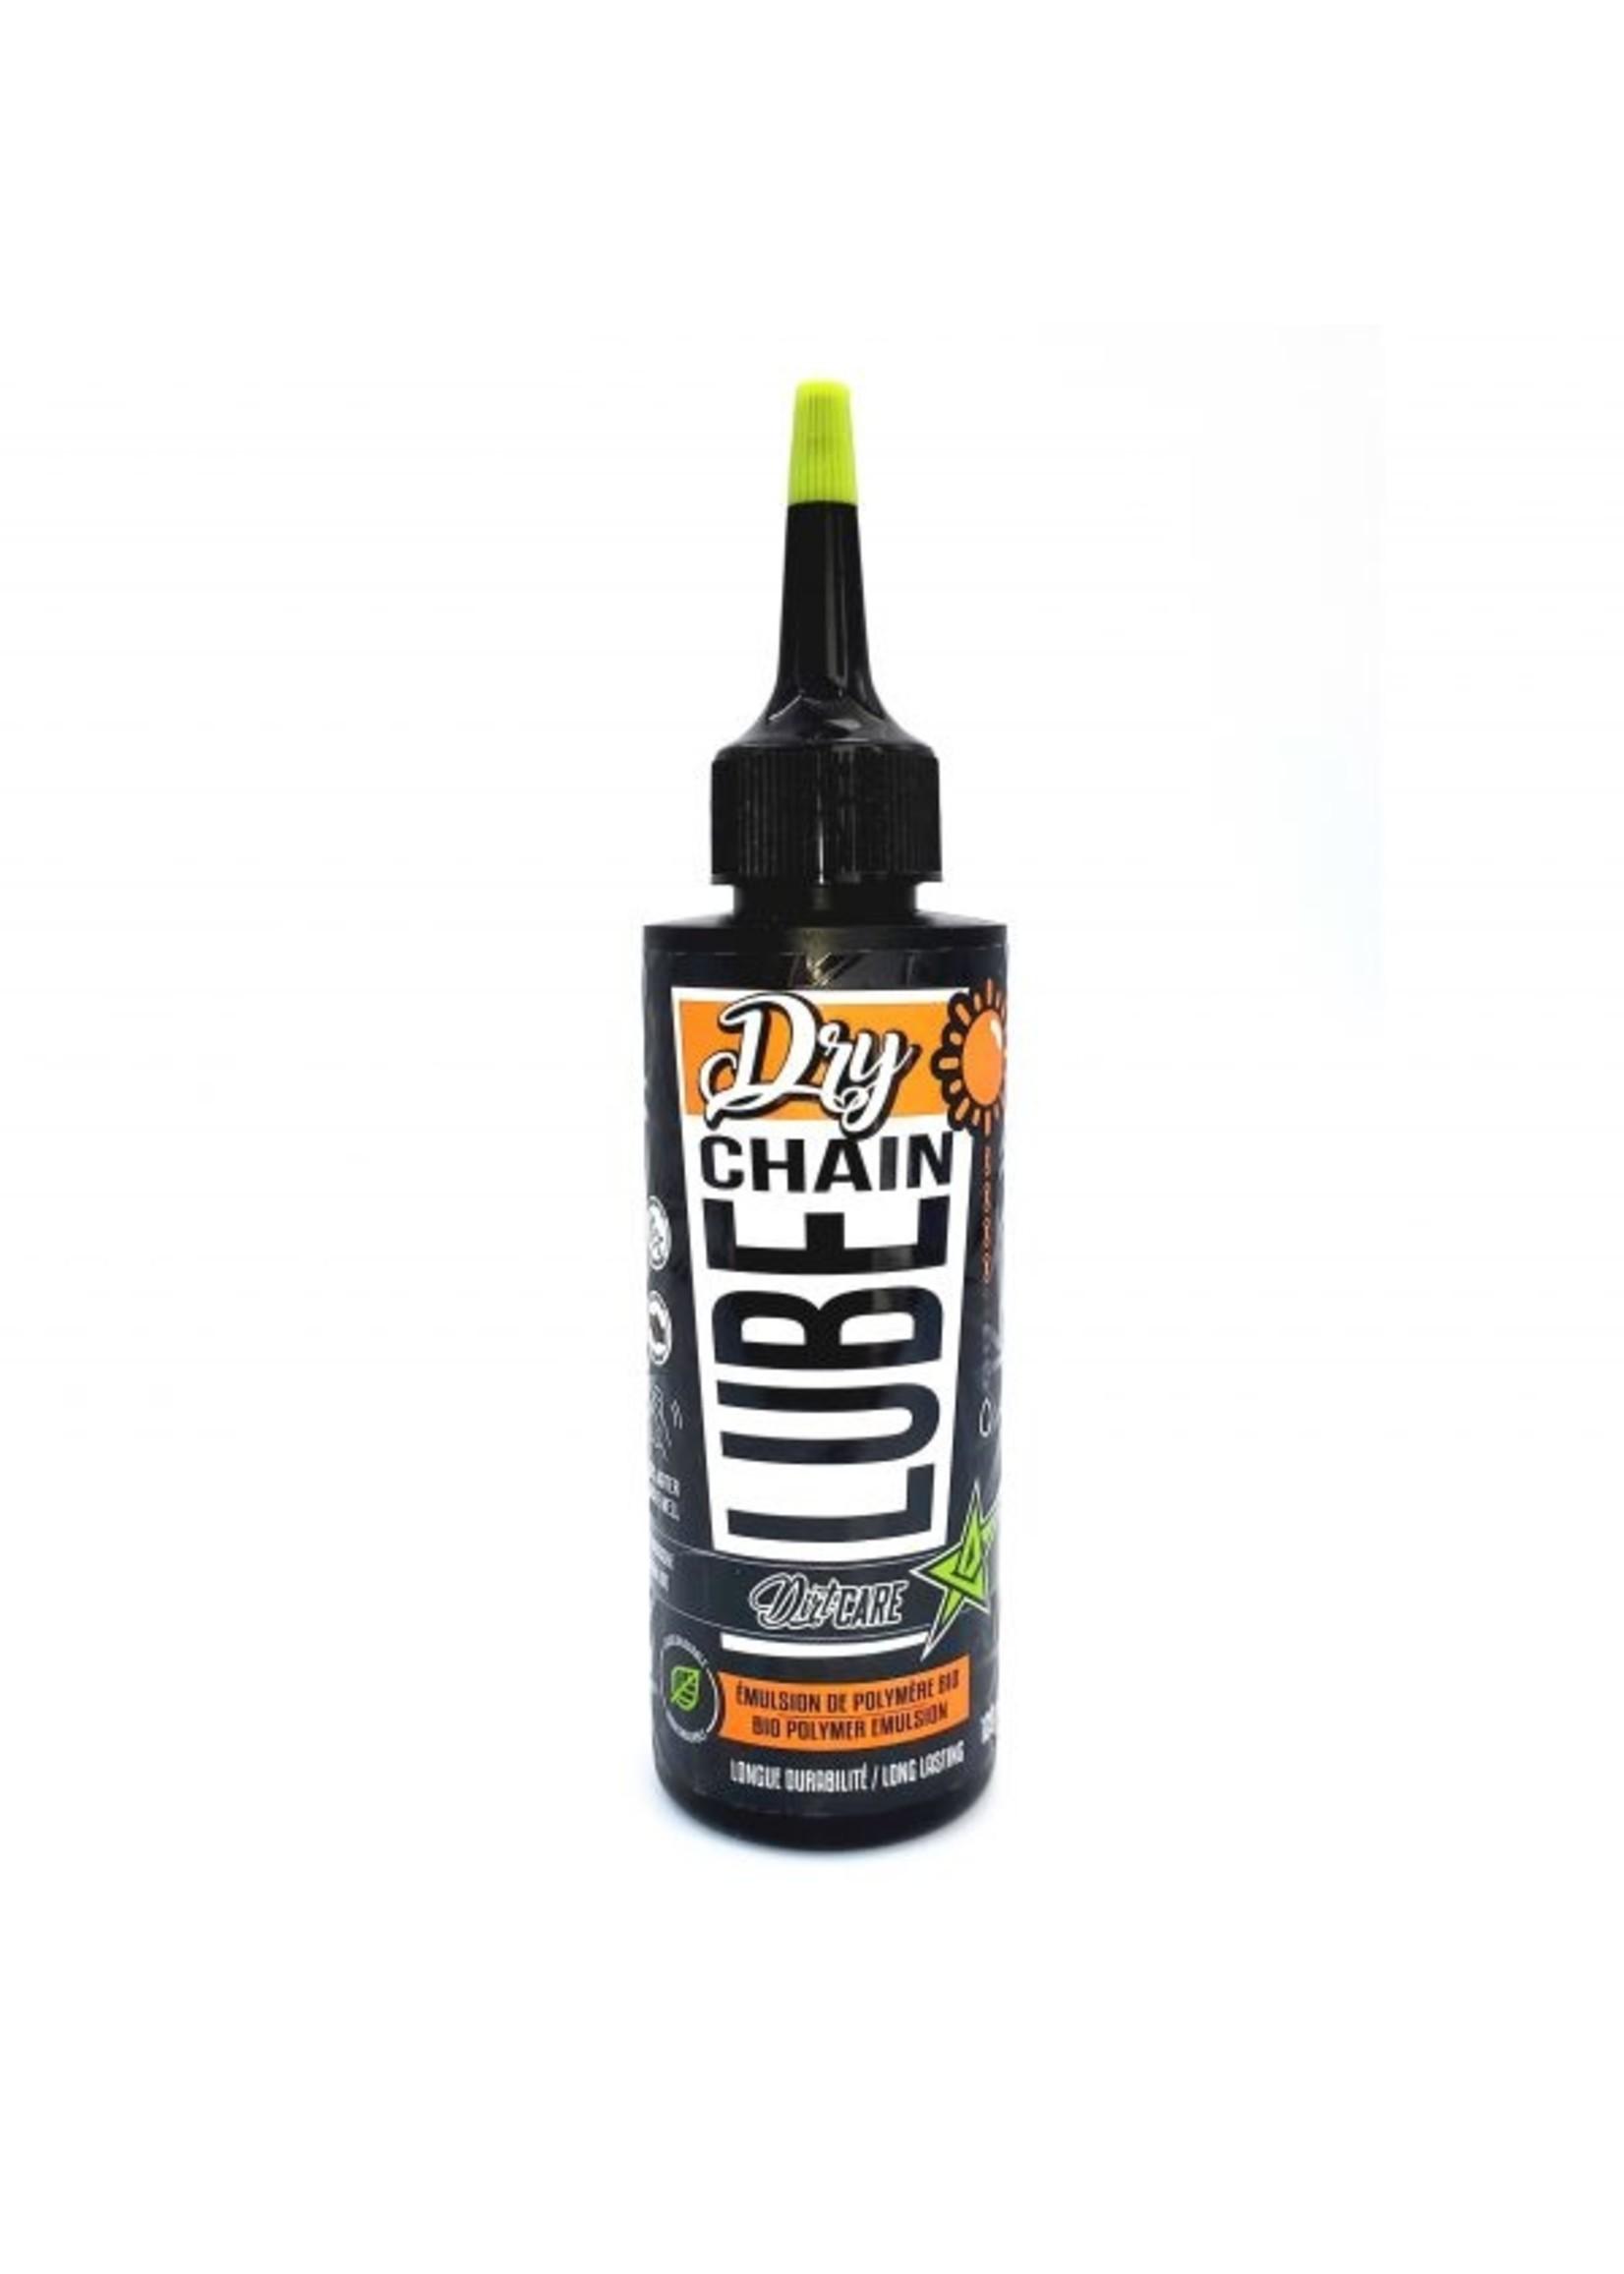 Dirt-Care Dry lube 120ml